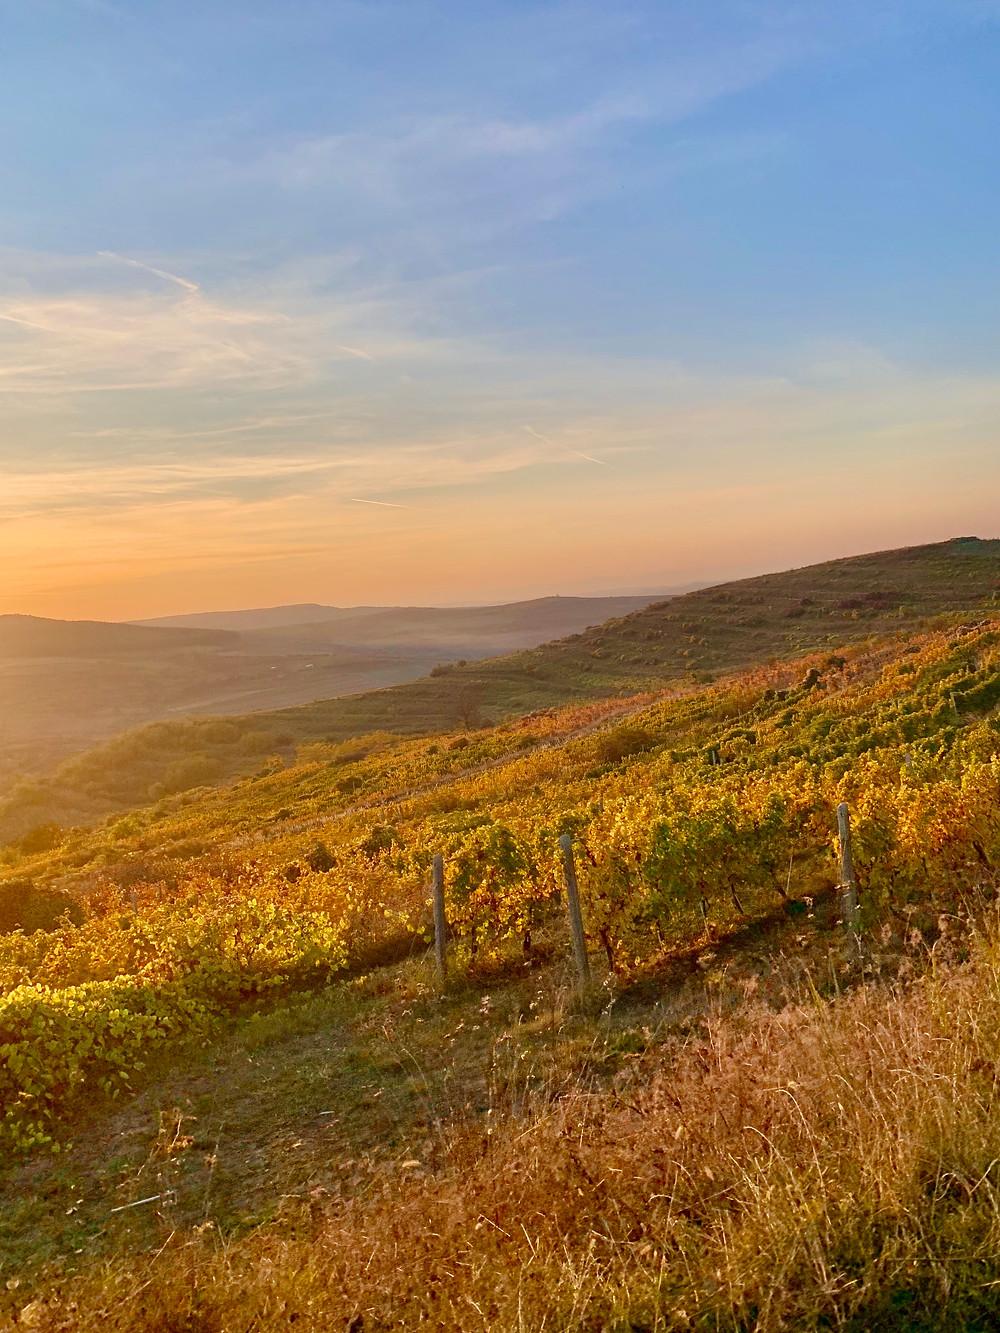 Stunning Scenery in Transylvania